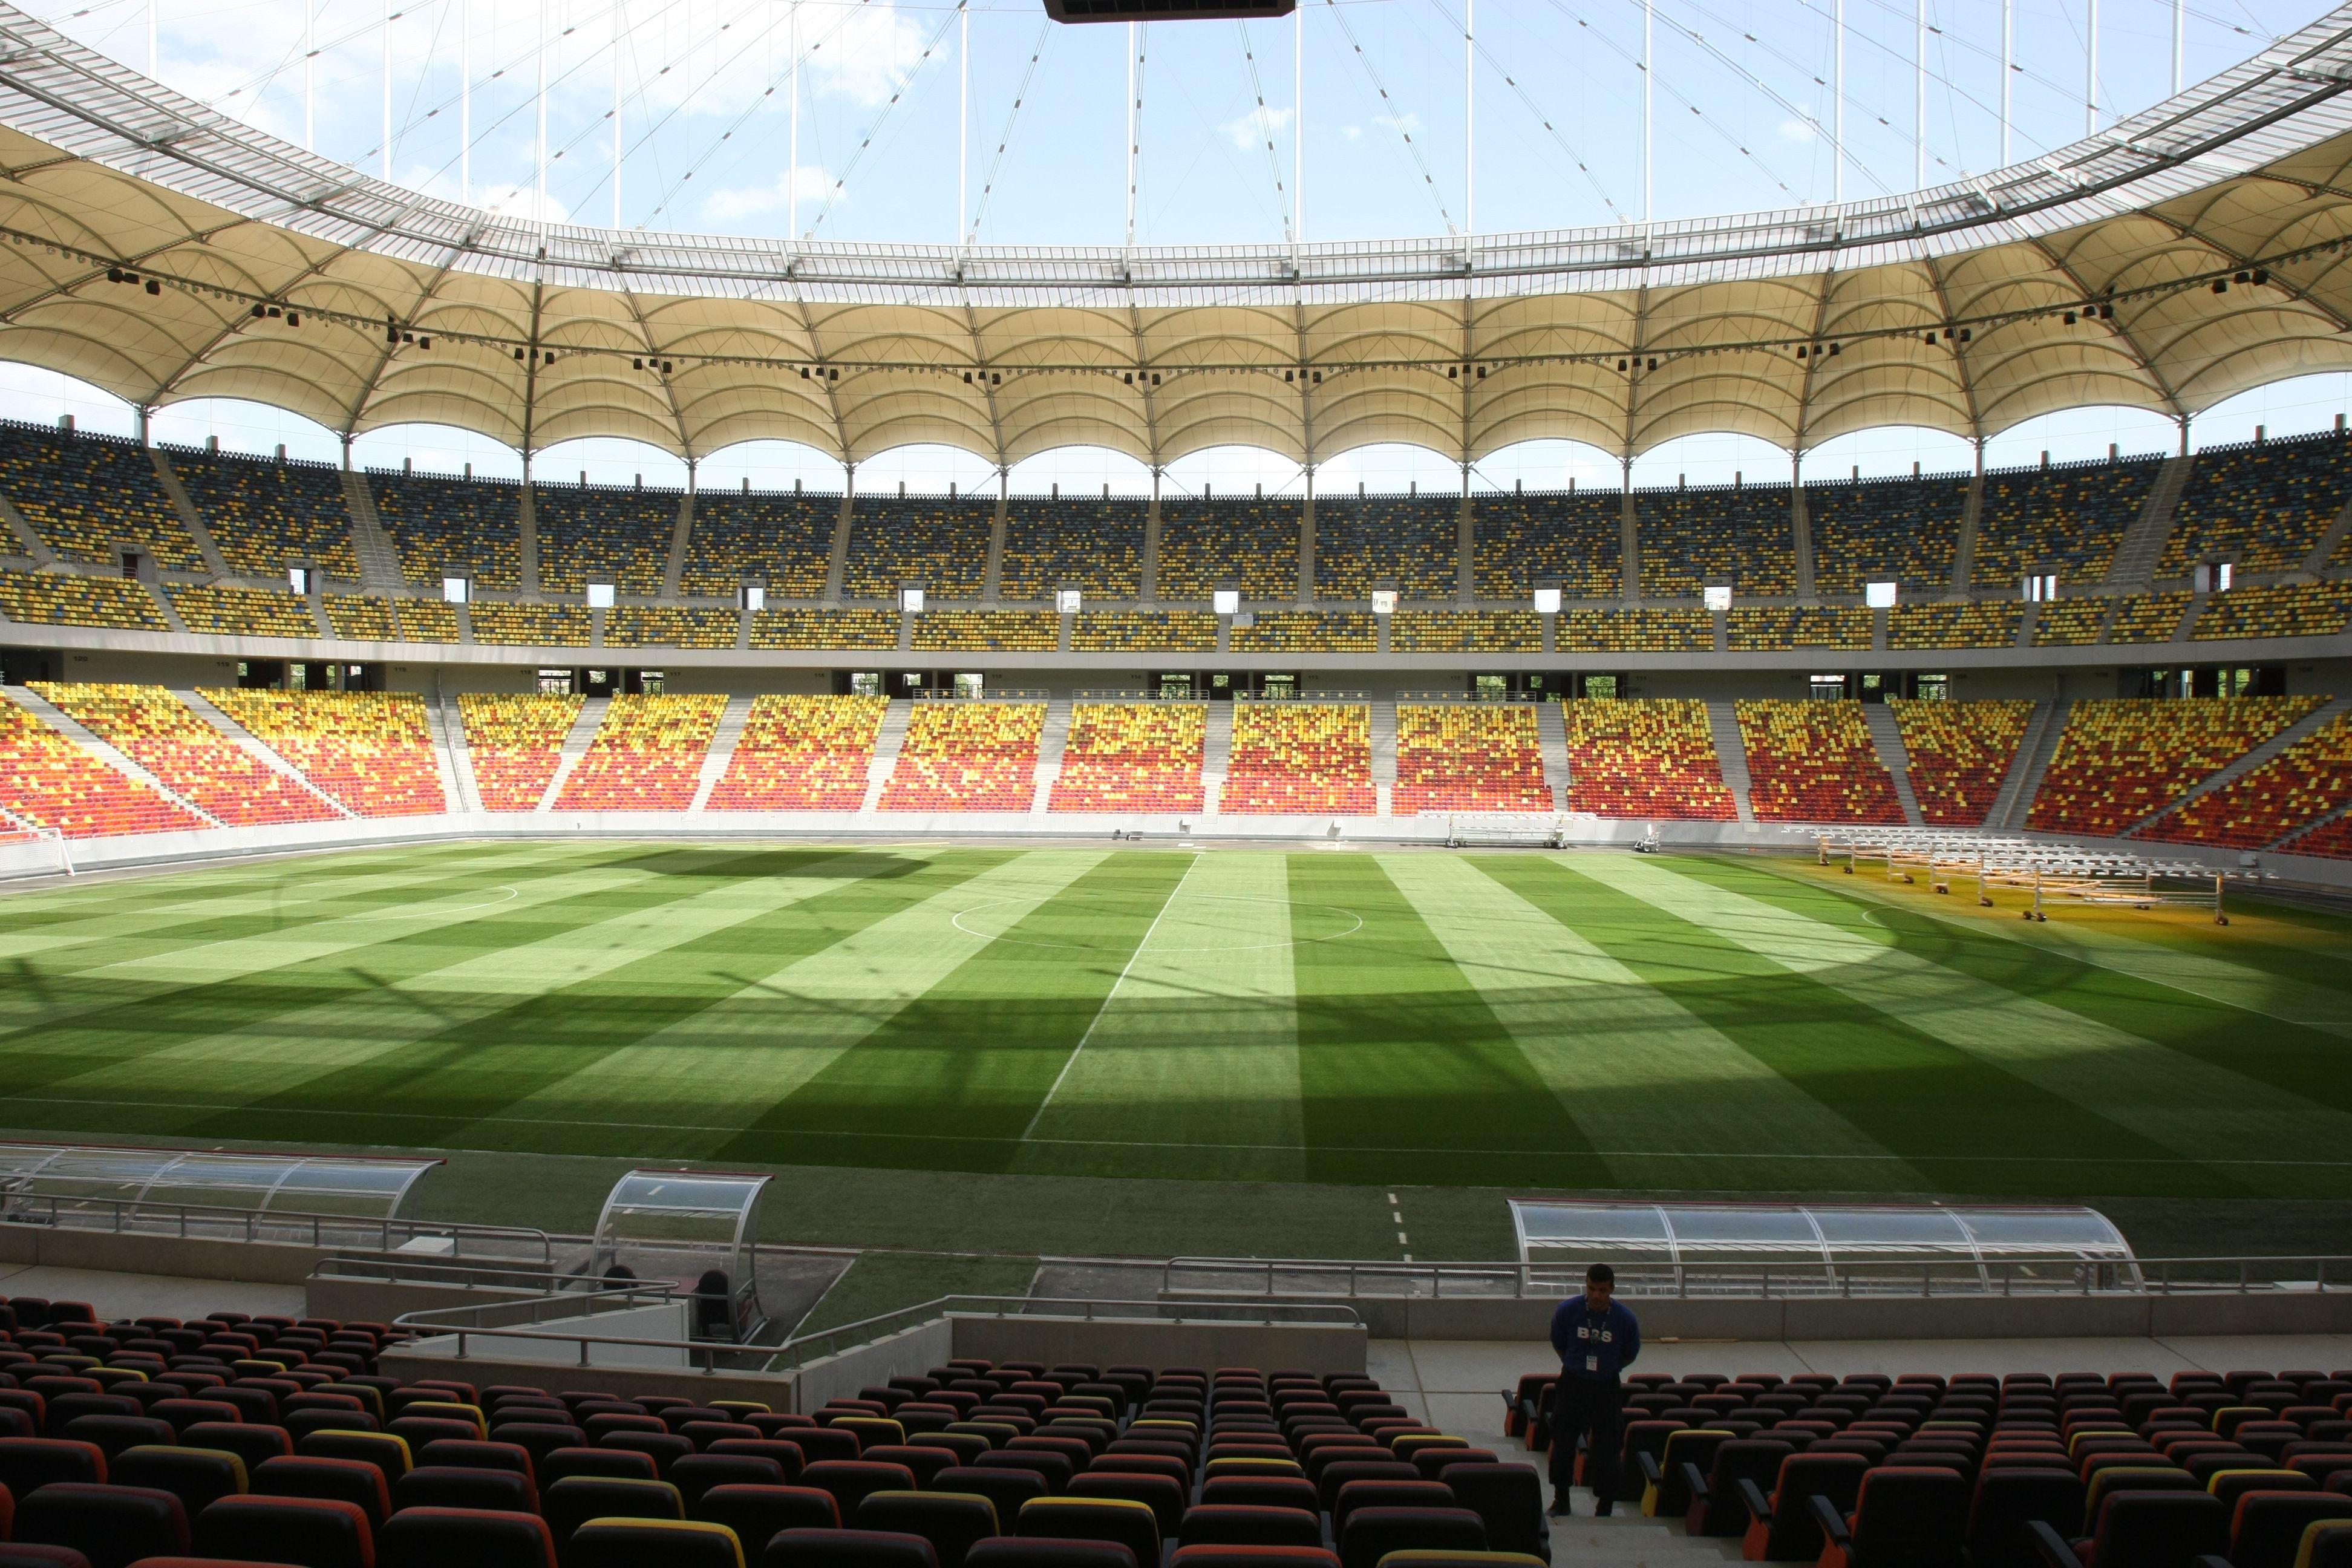 Arena Națională, Bucarest, Rumania. Capacidad 55 611 espectadores, Equipo local Seleccion  Rumanía.